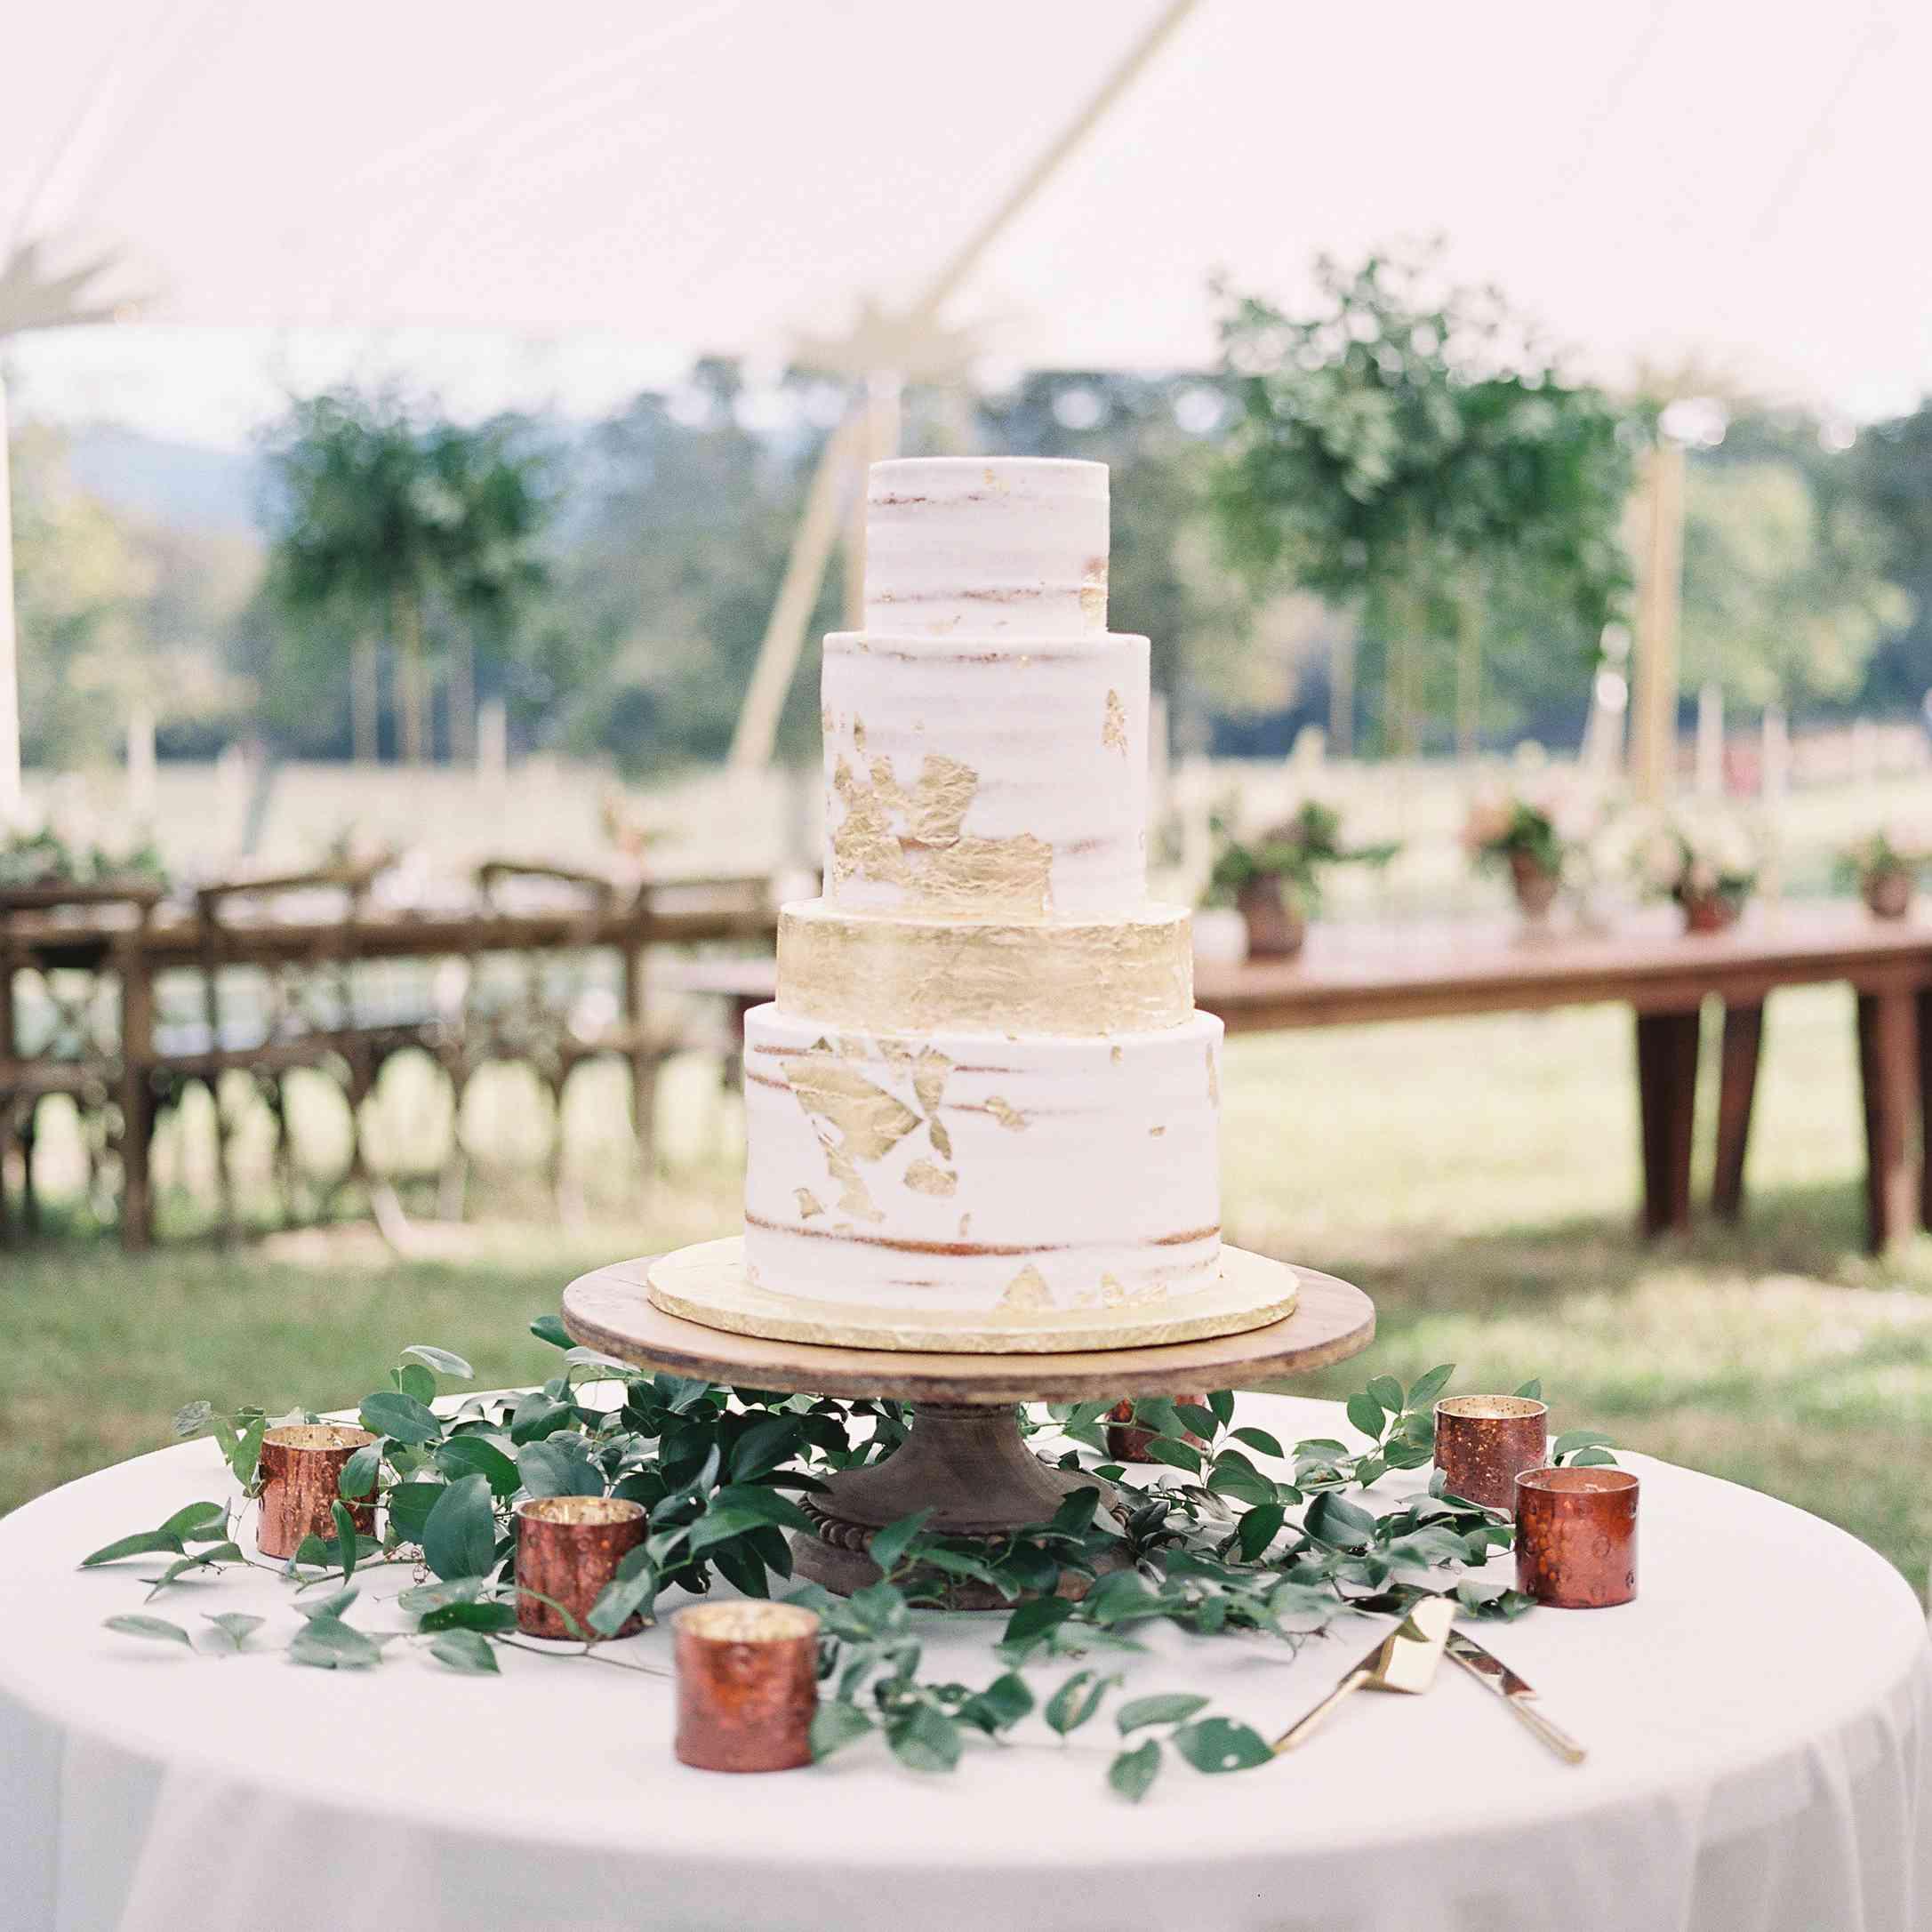 <p>Semi Naked wedding cake</p><br><br>